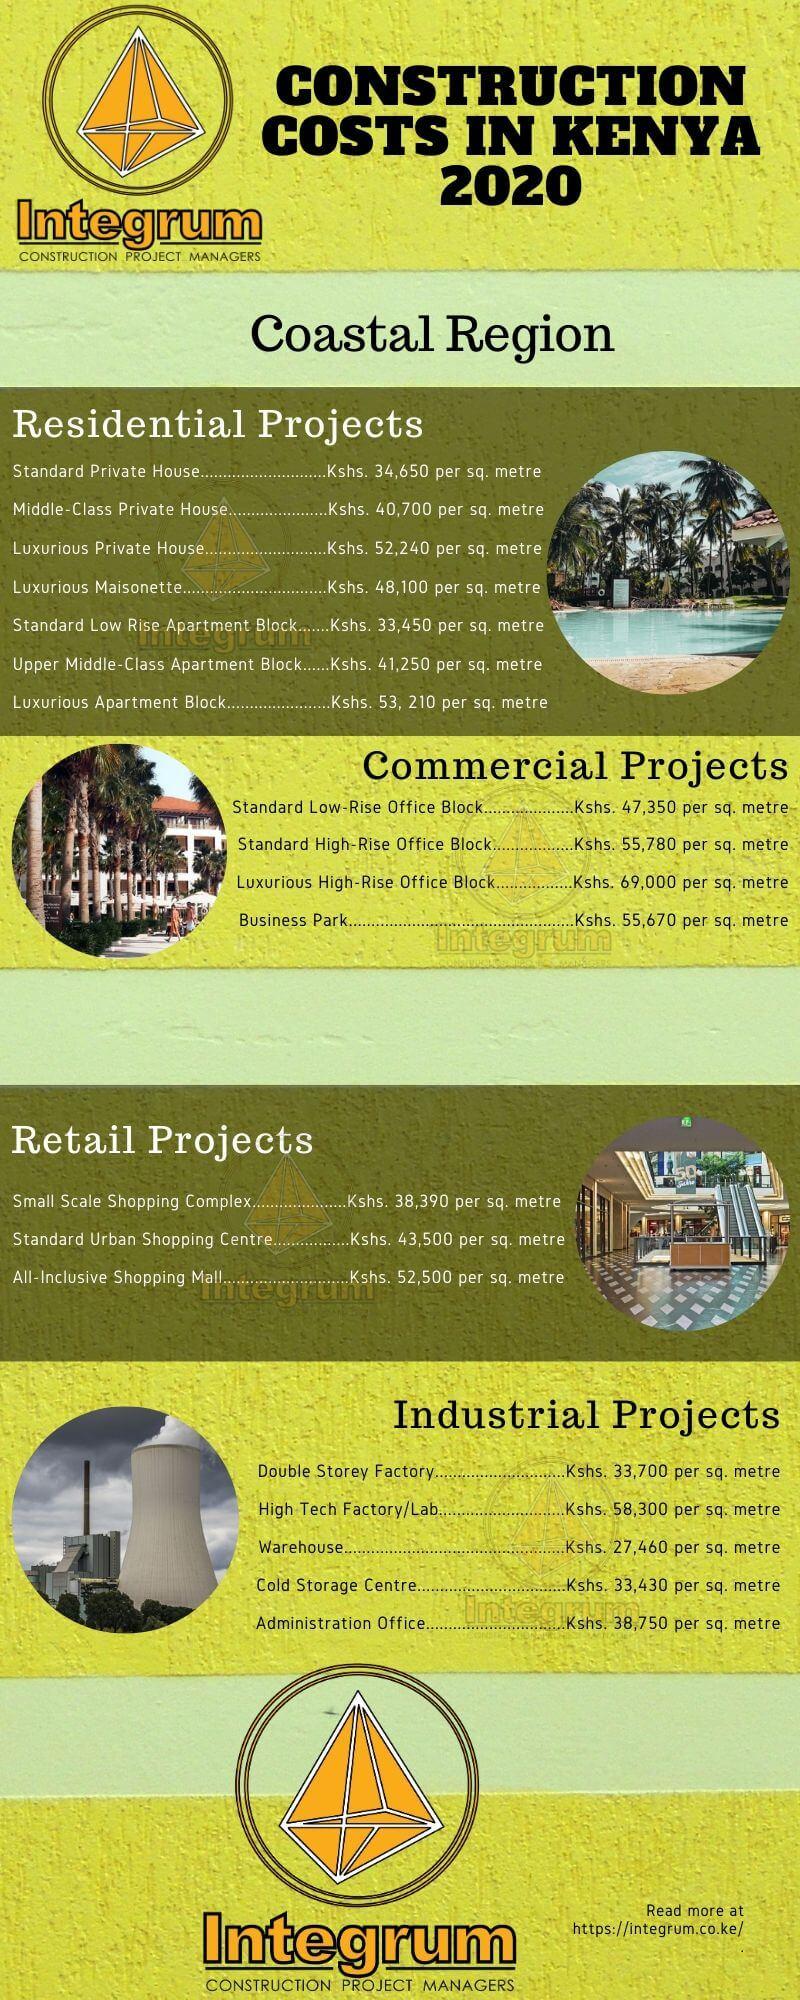 Coastal construction costs in Kenya